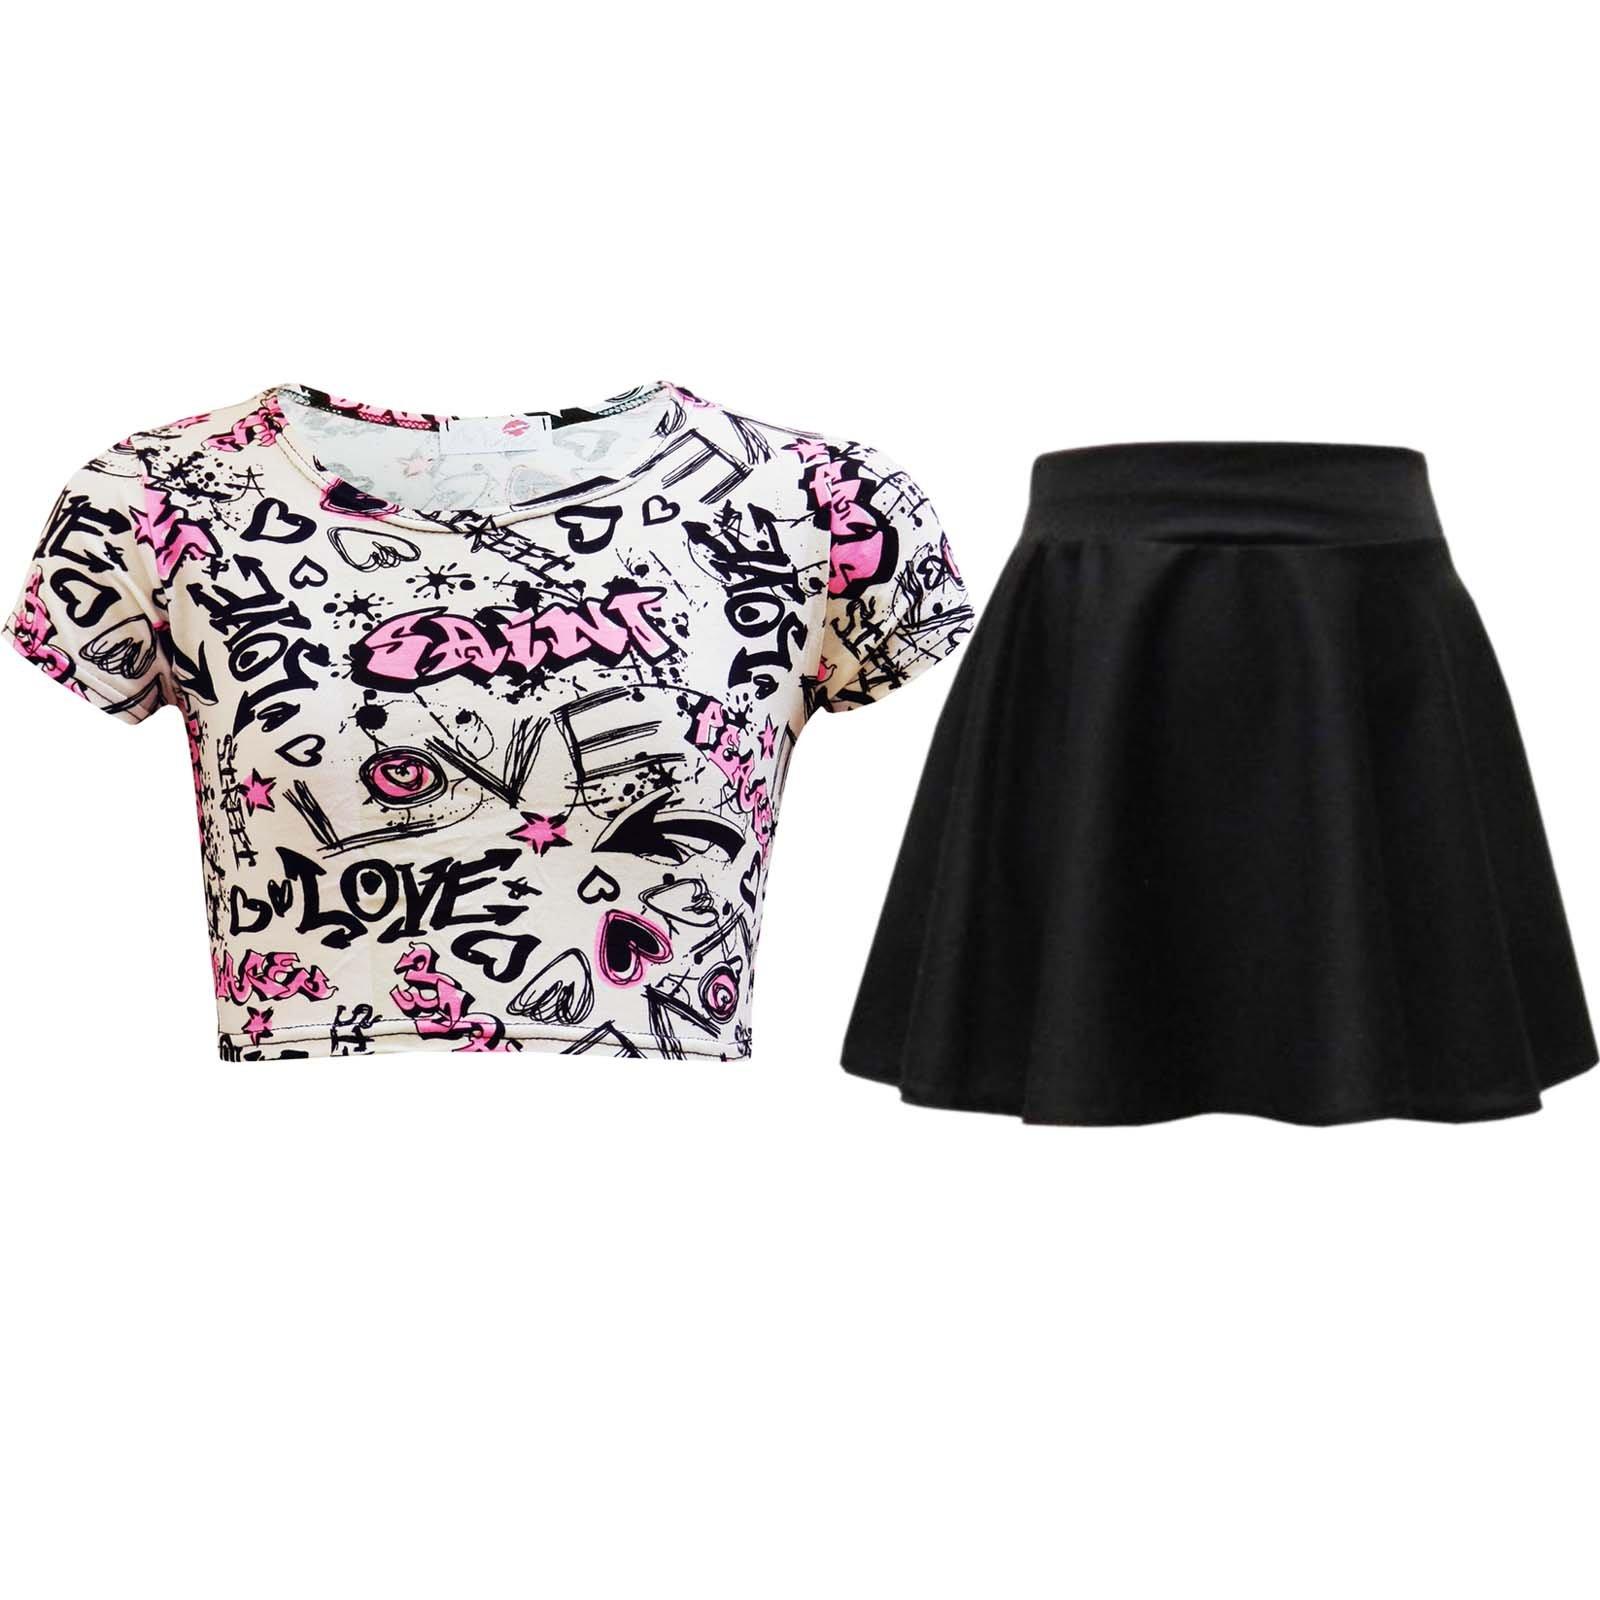 Kids Girls Love Graffiti Crop Top & Black Skater Skirt Set 7 8 9 10 11 12 13 Yr by a2z4kids (Image #2)